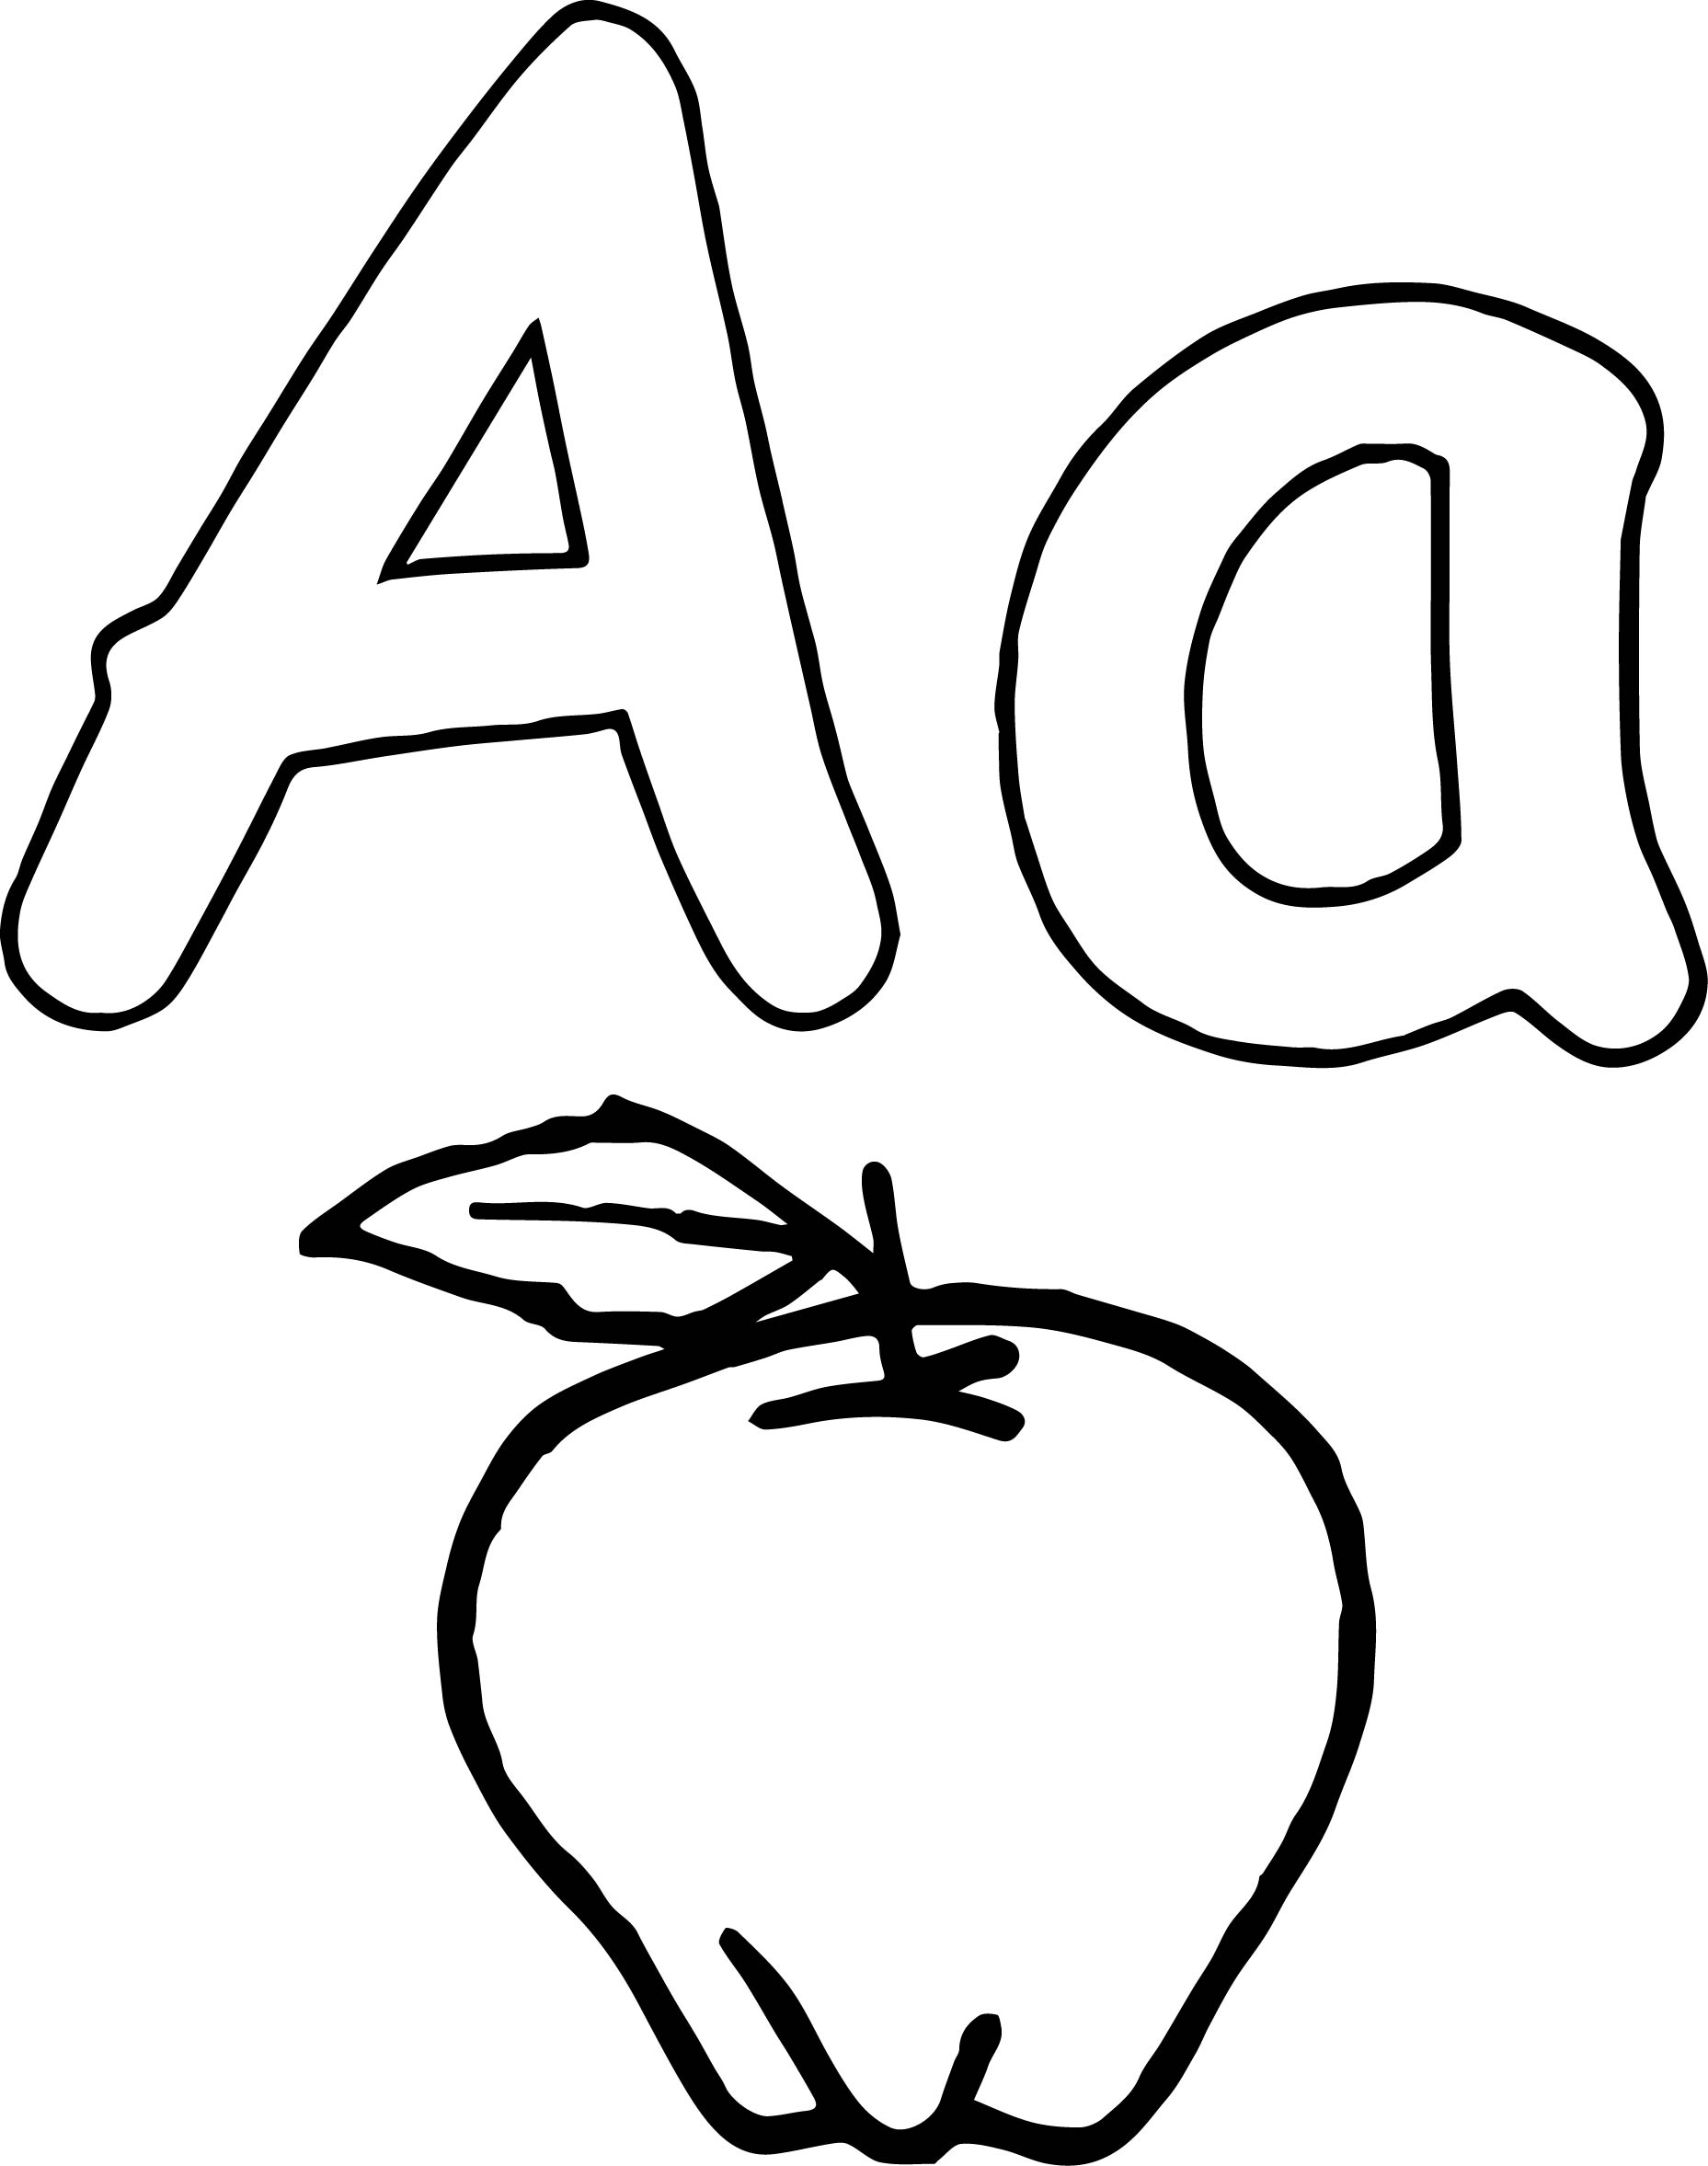 Gambar Happy Apple Tree Coloring Page Wecoloringpage Jpeg Png Gif Aa